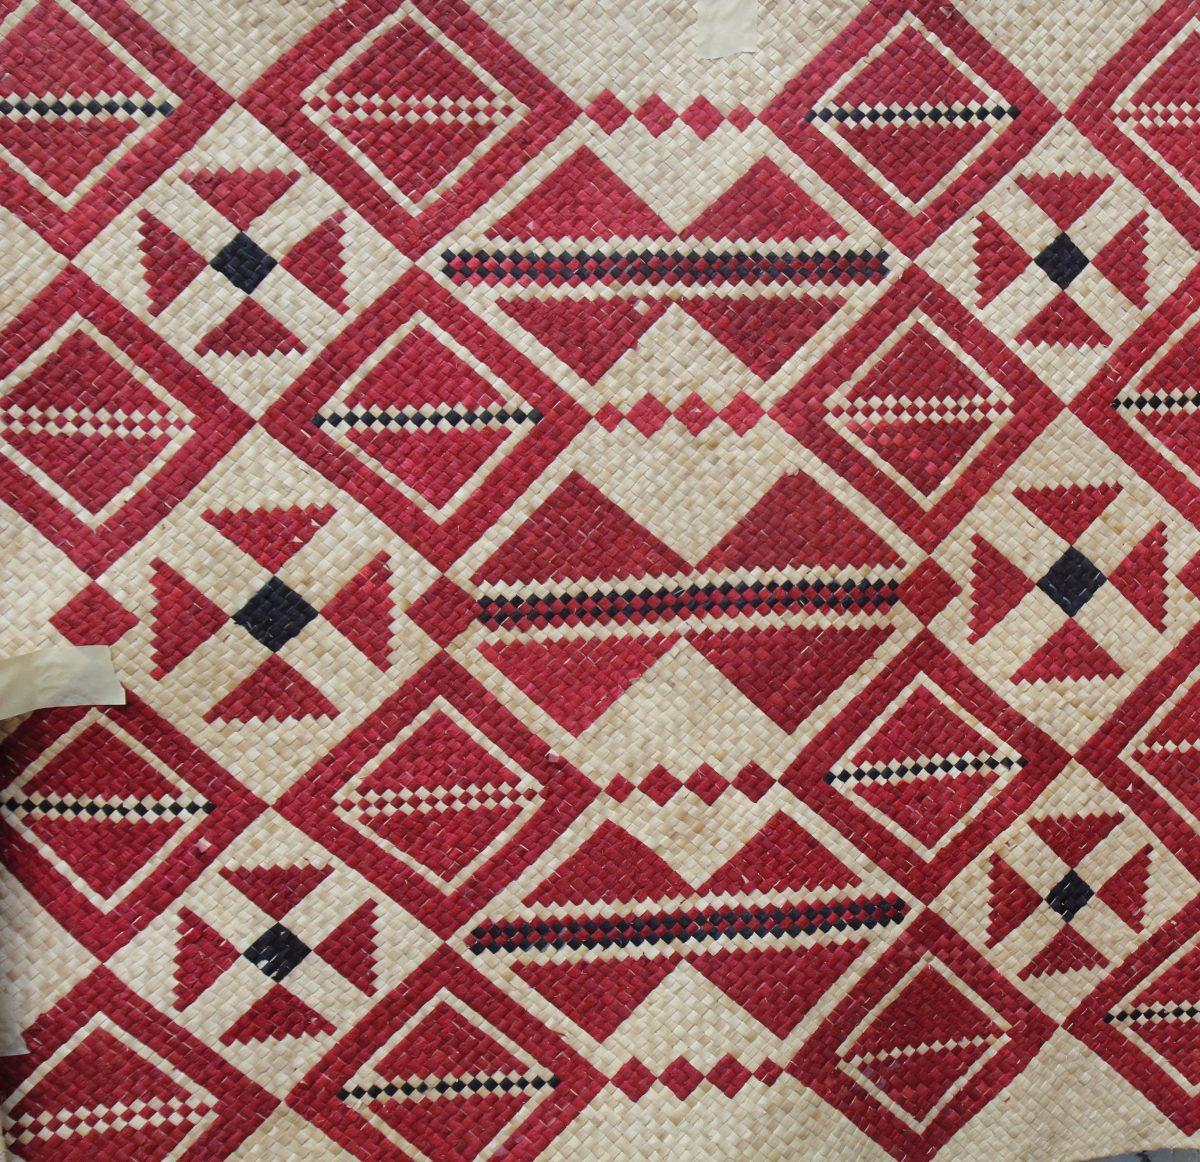 Handmade traditional mat